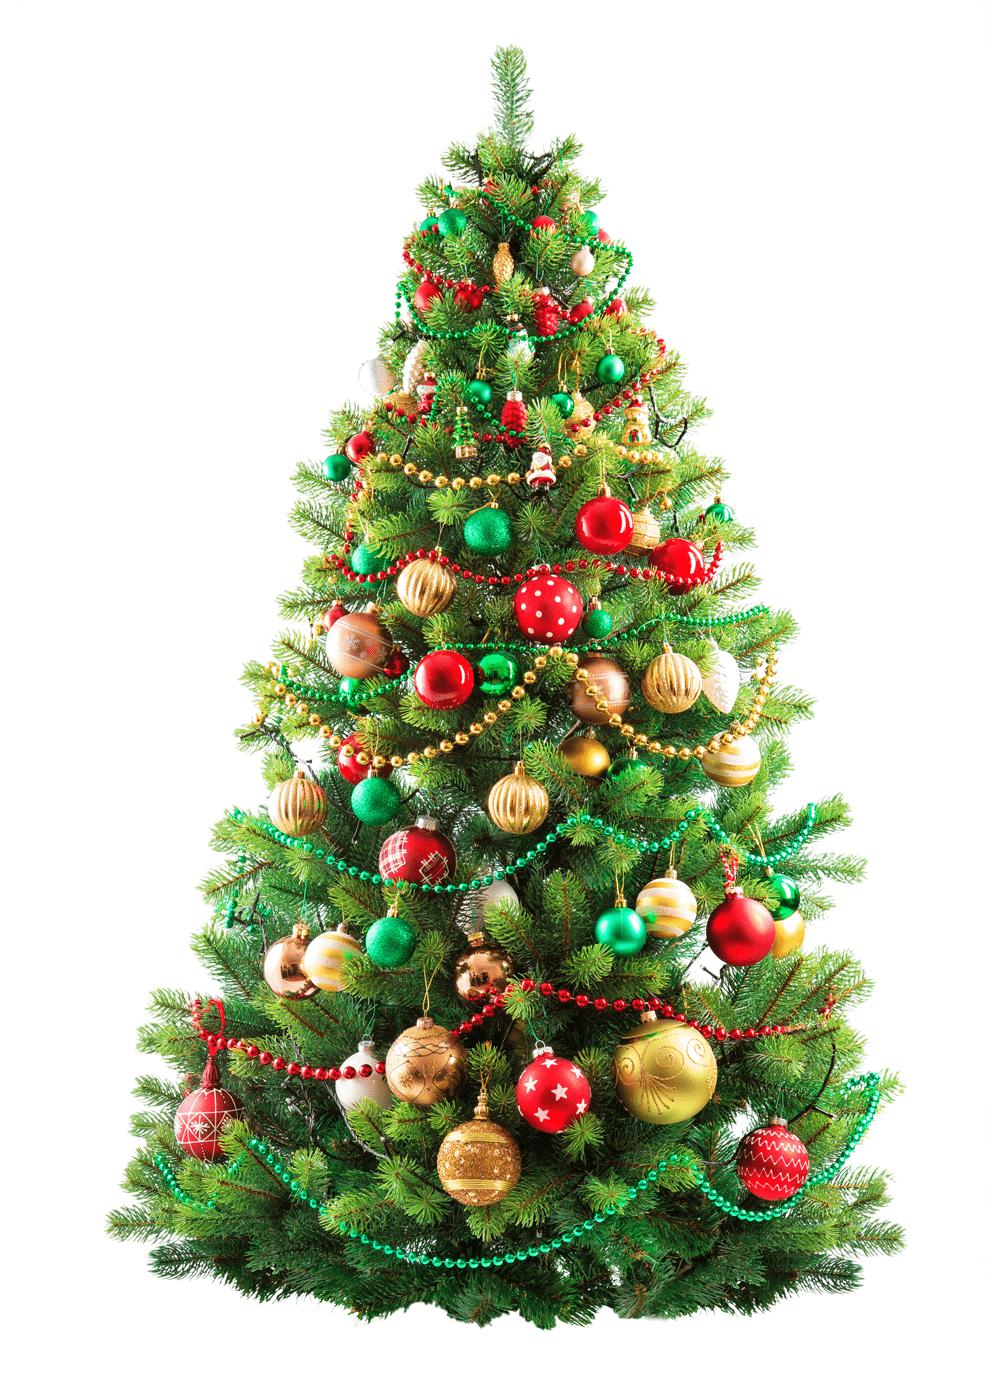 Lieblings-Weihnachtsritual